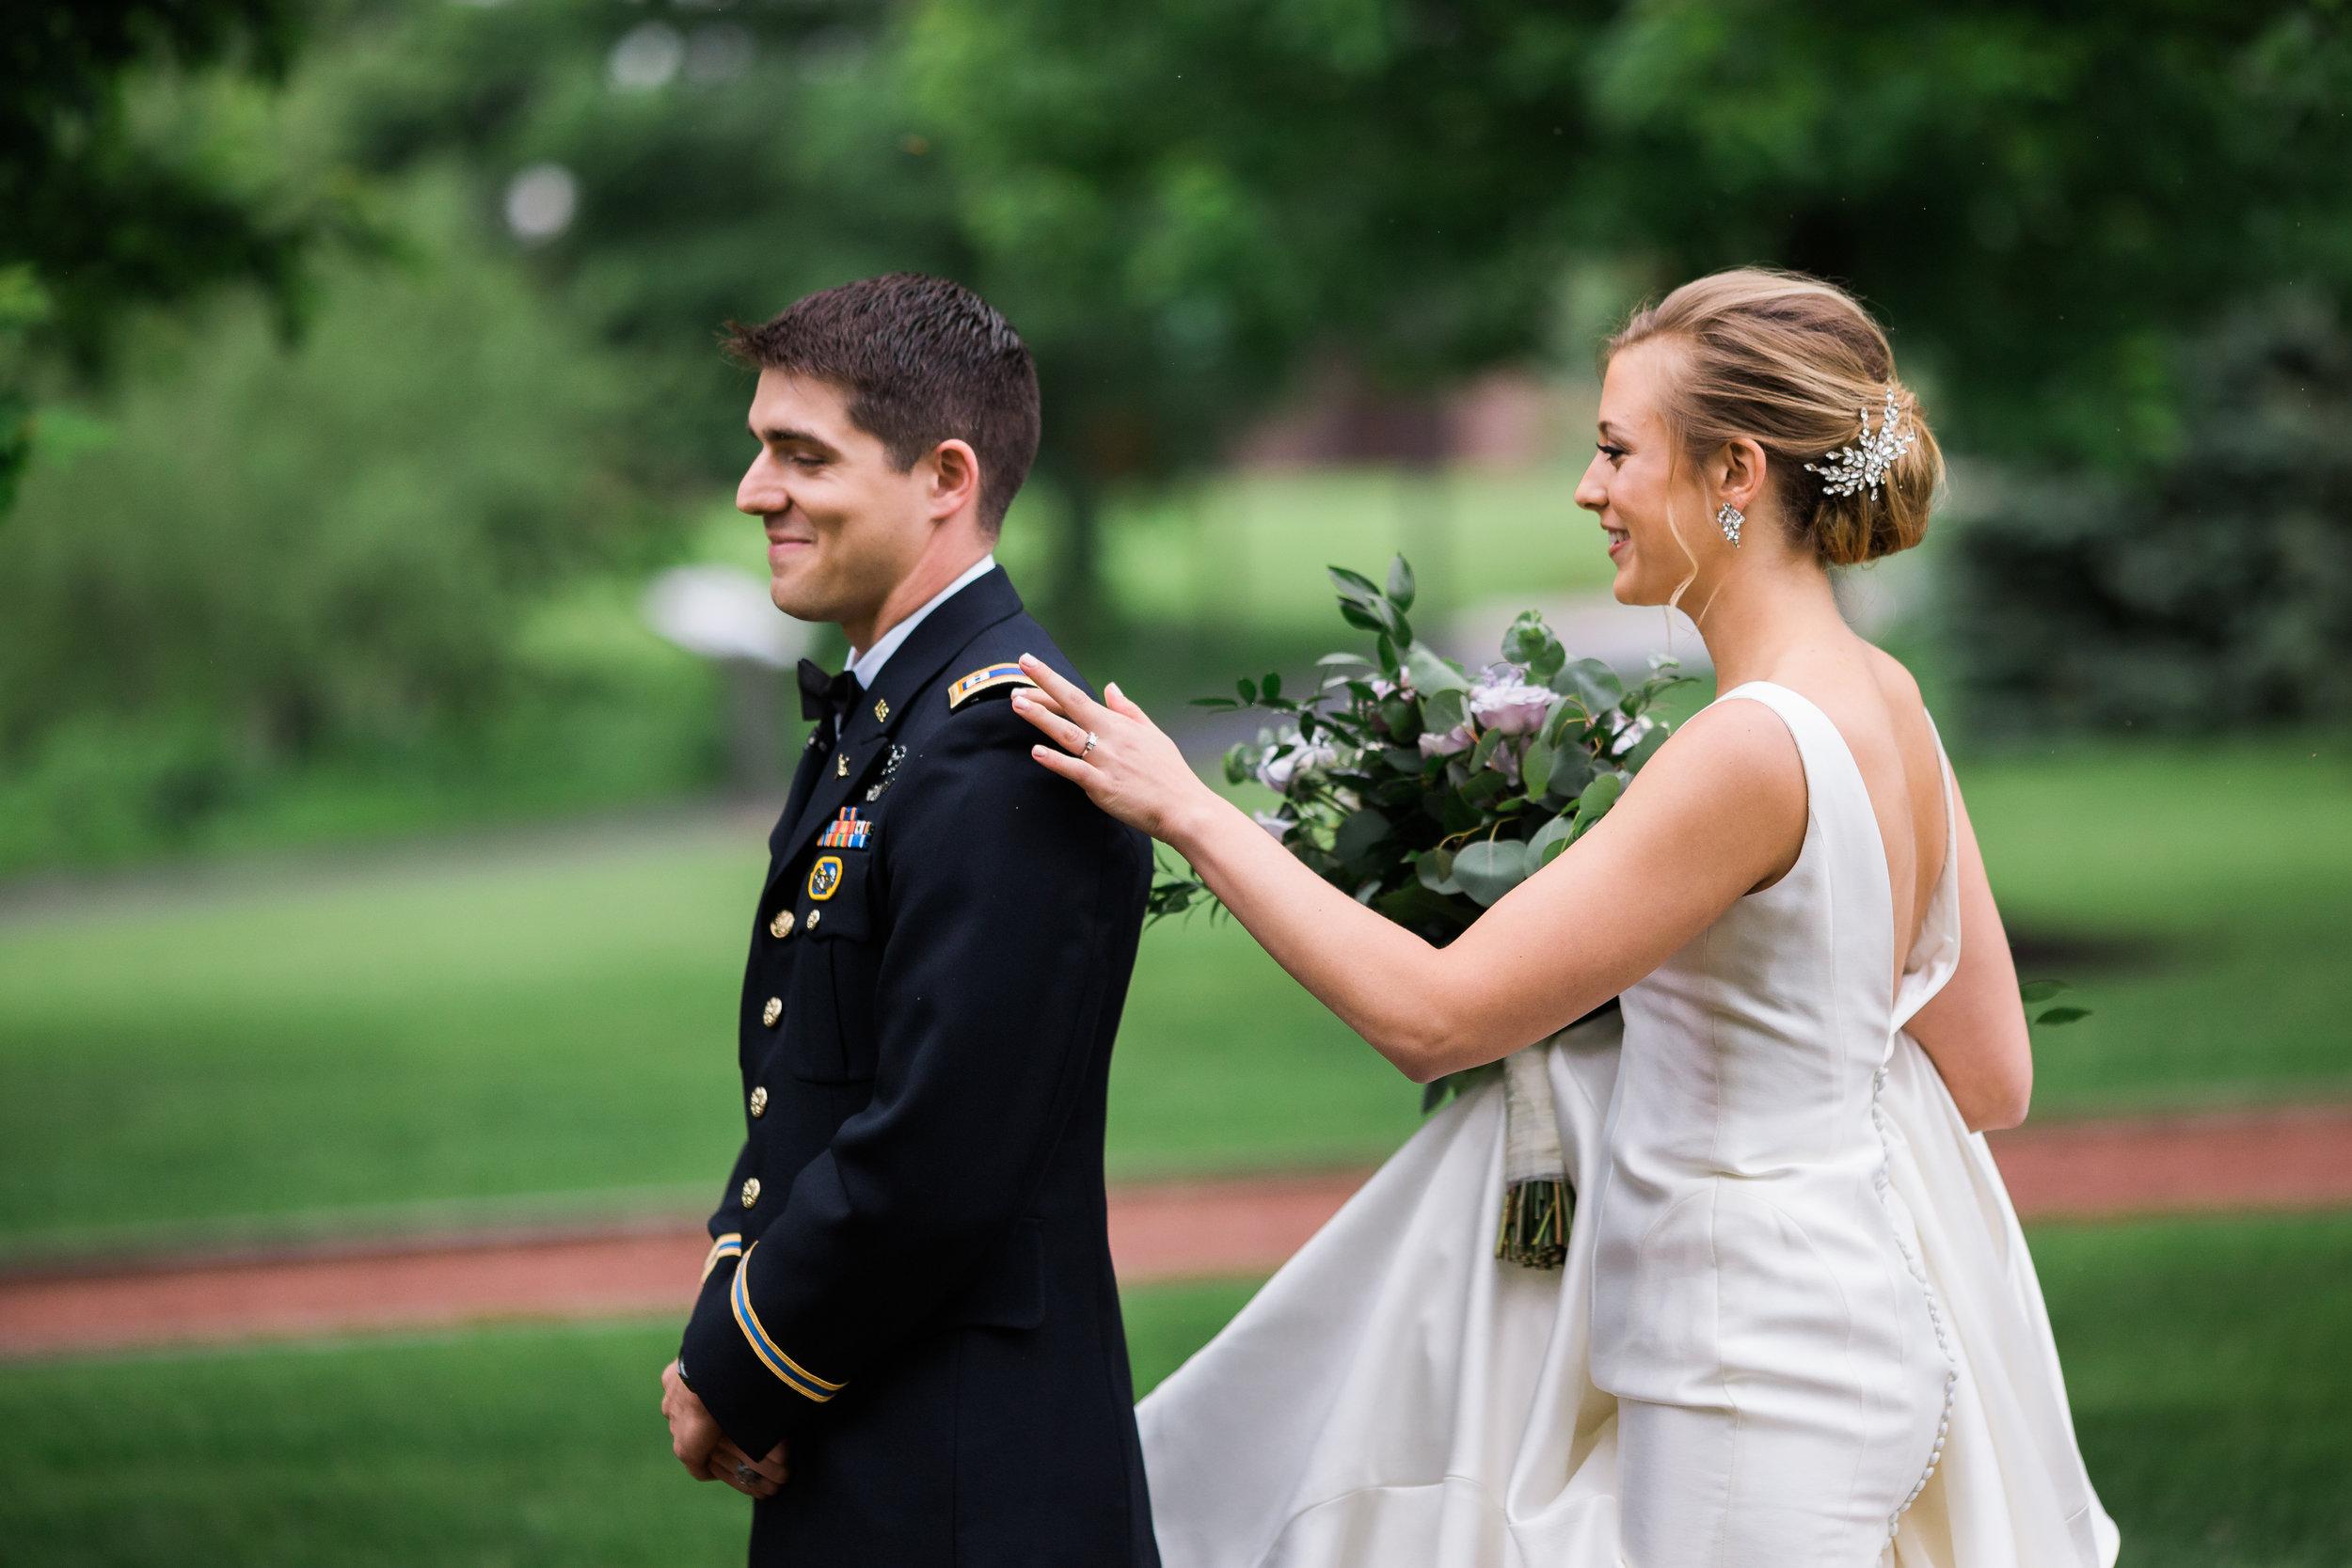 Centennial-Park-Munster-indiana-bride-and-groom-Lauren-ashley-studios-first-look-touch.jpg